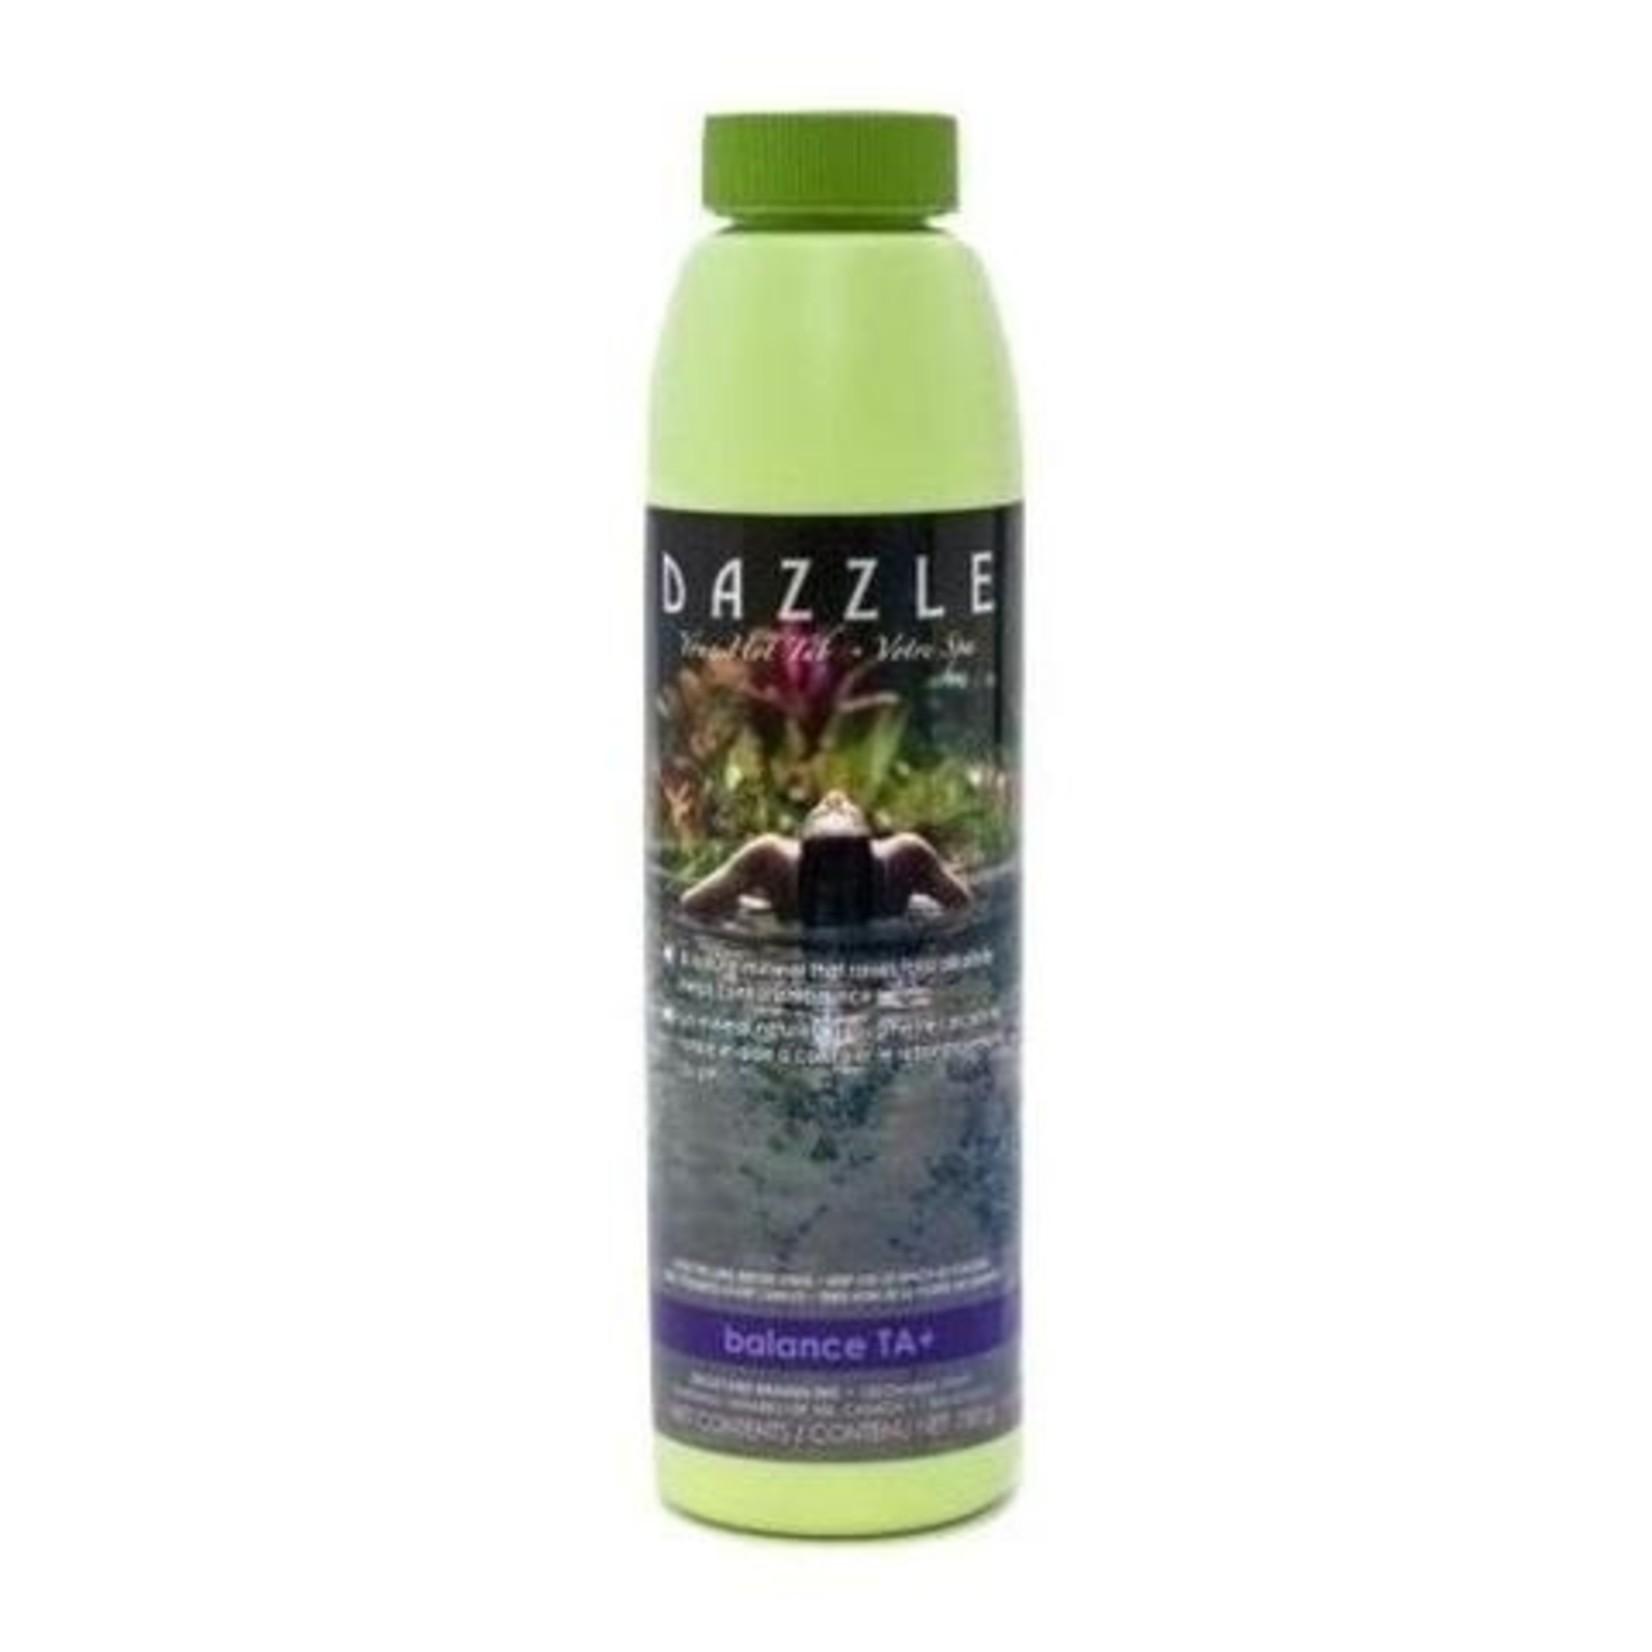 Dazzle Balance TA+ (750 g)